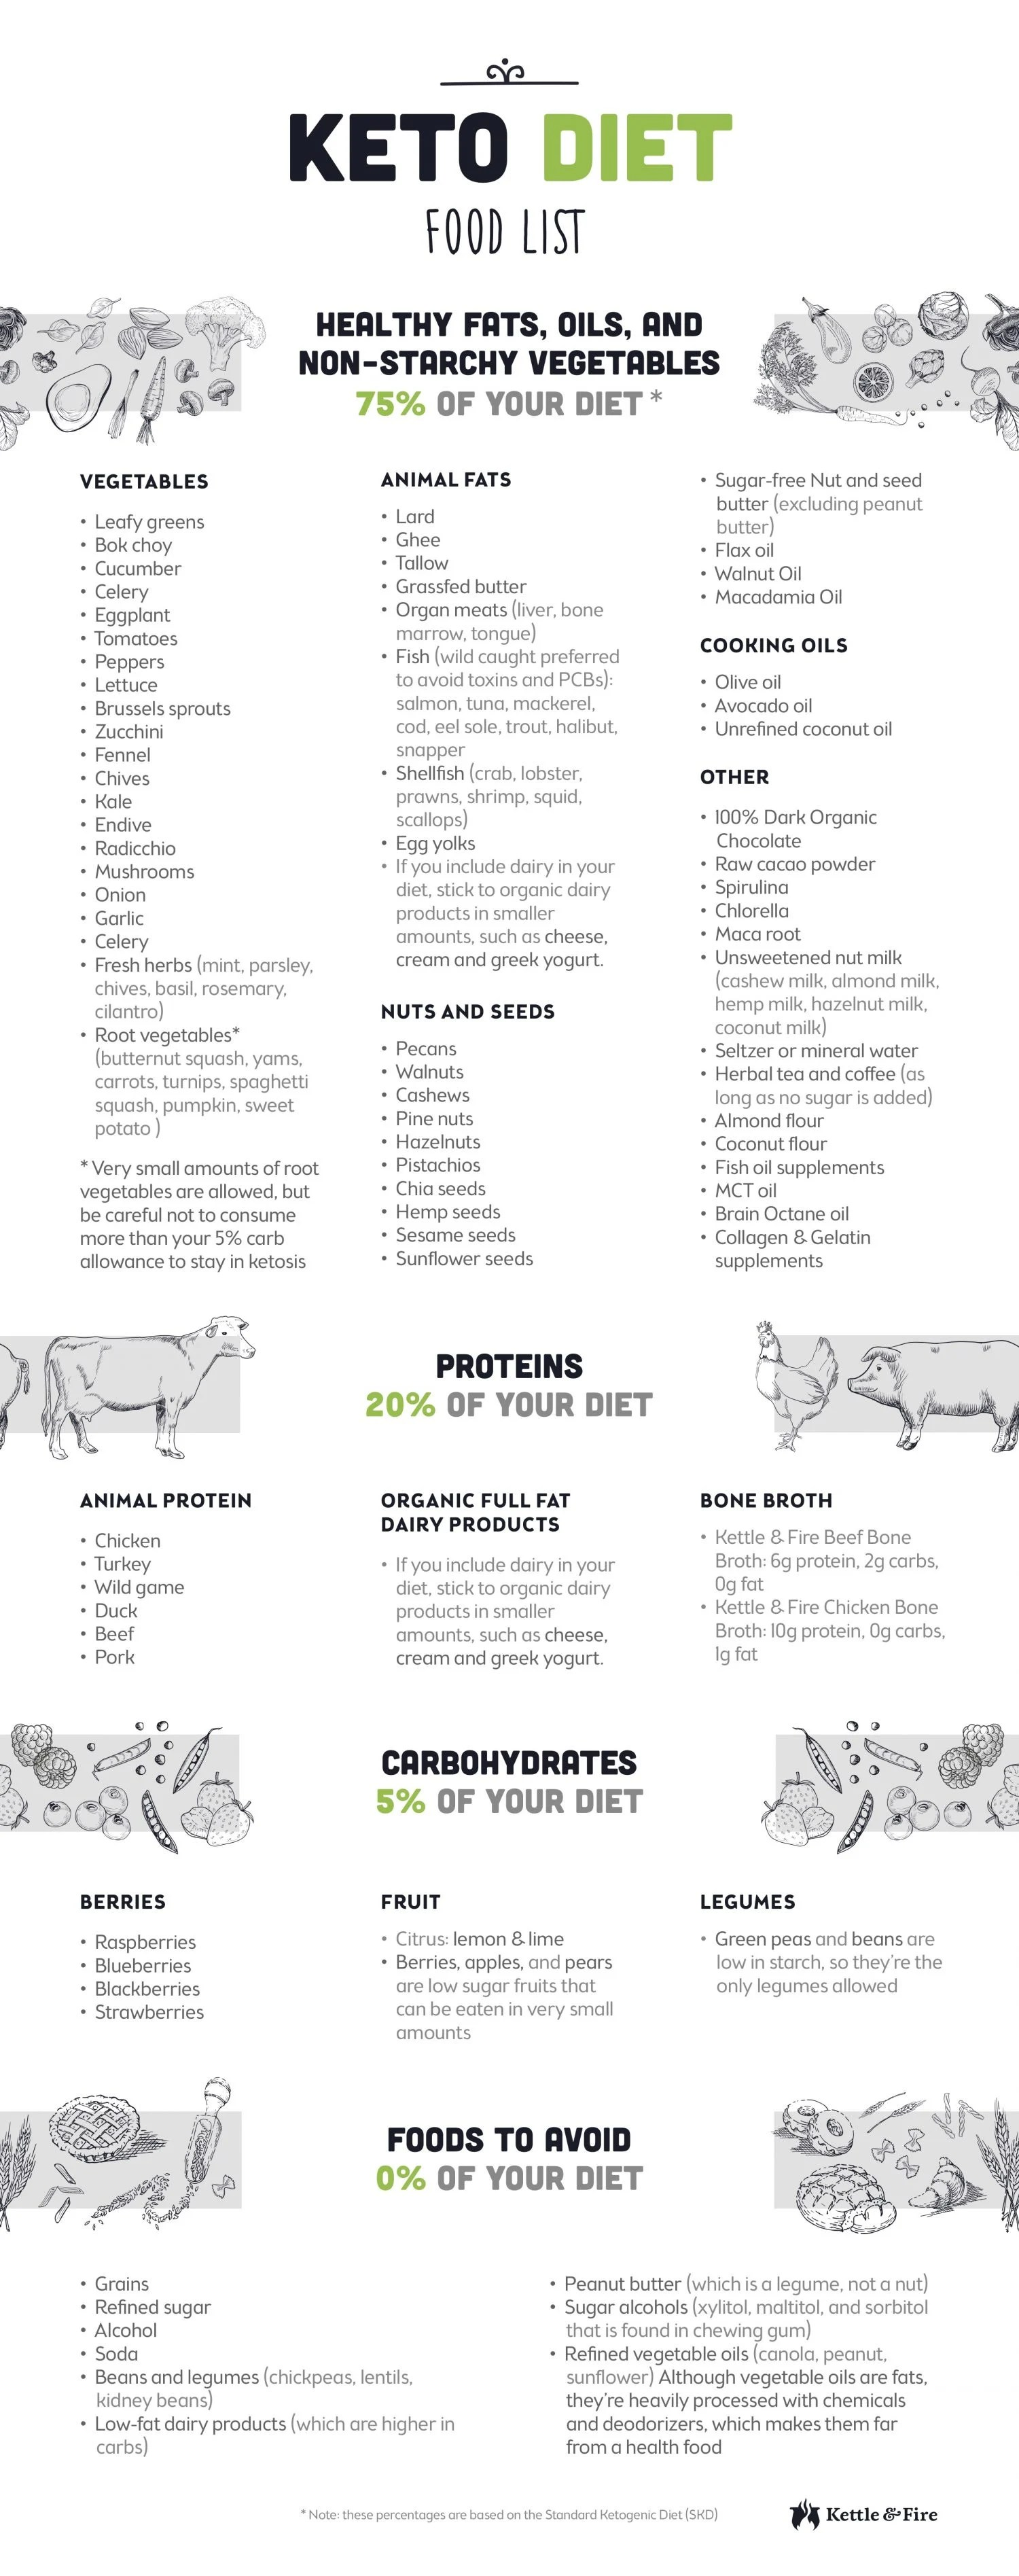 81 Keto Food List For Ultimate Fat Burning Printable